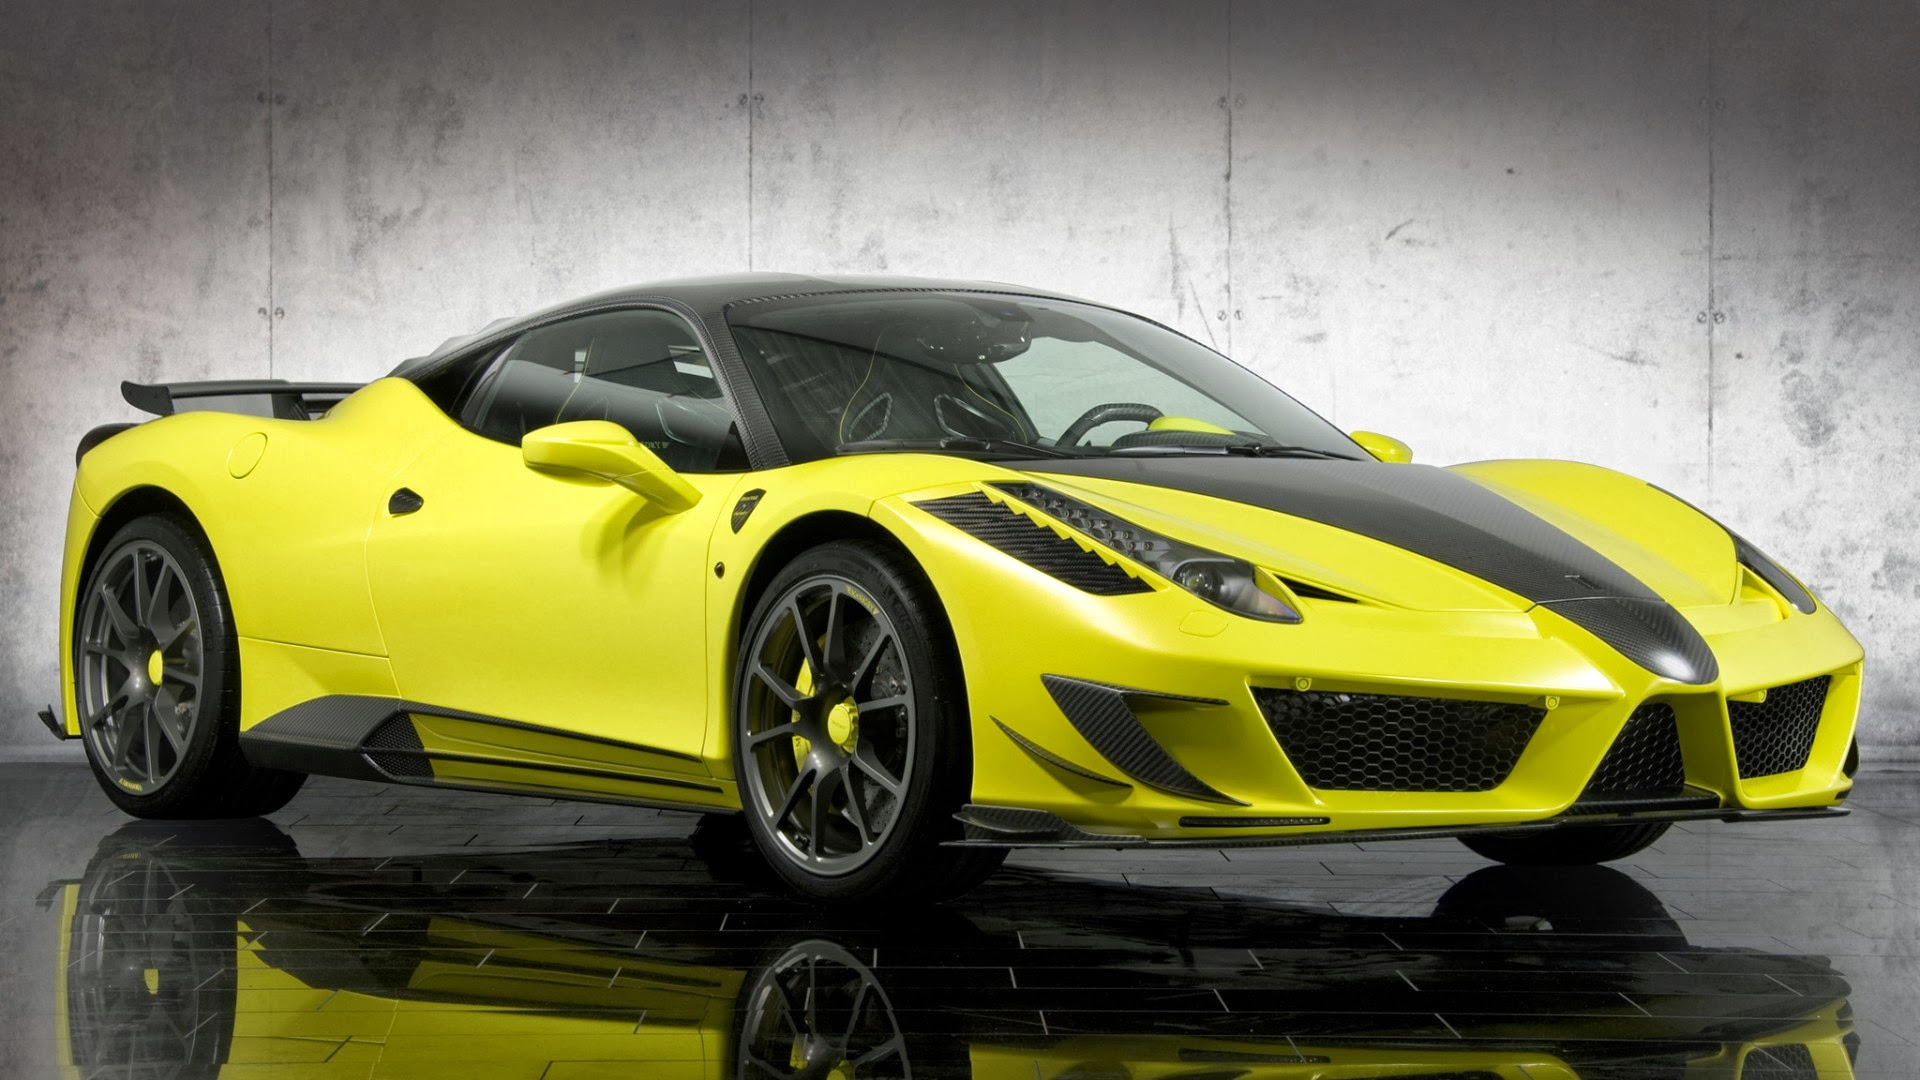 Autos Tuning Hd: Deportivos Ferrari Tuning